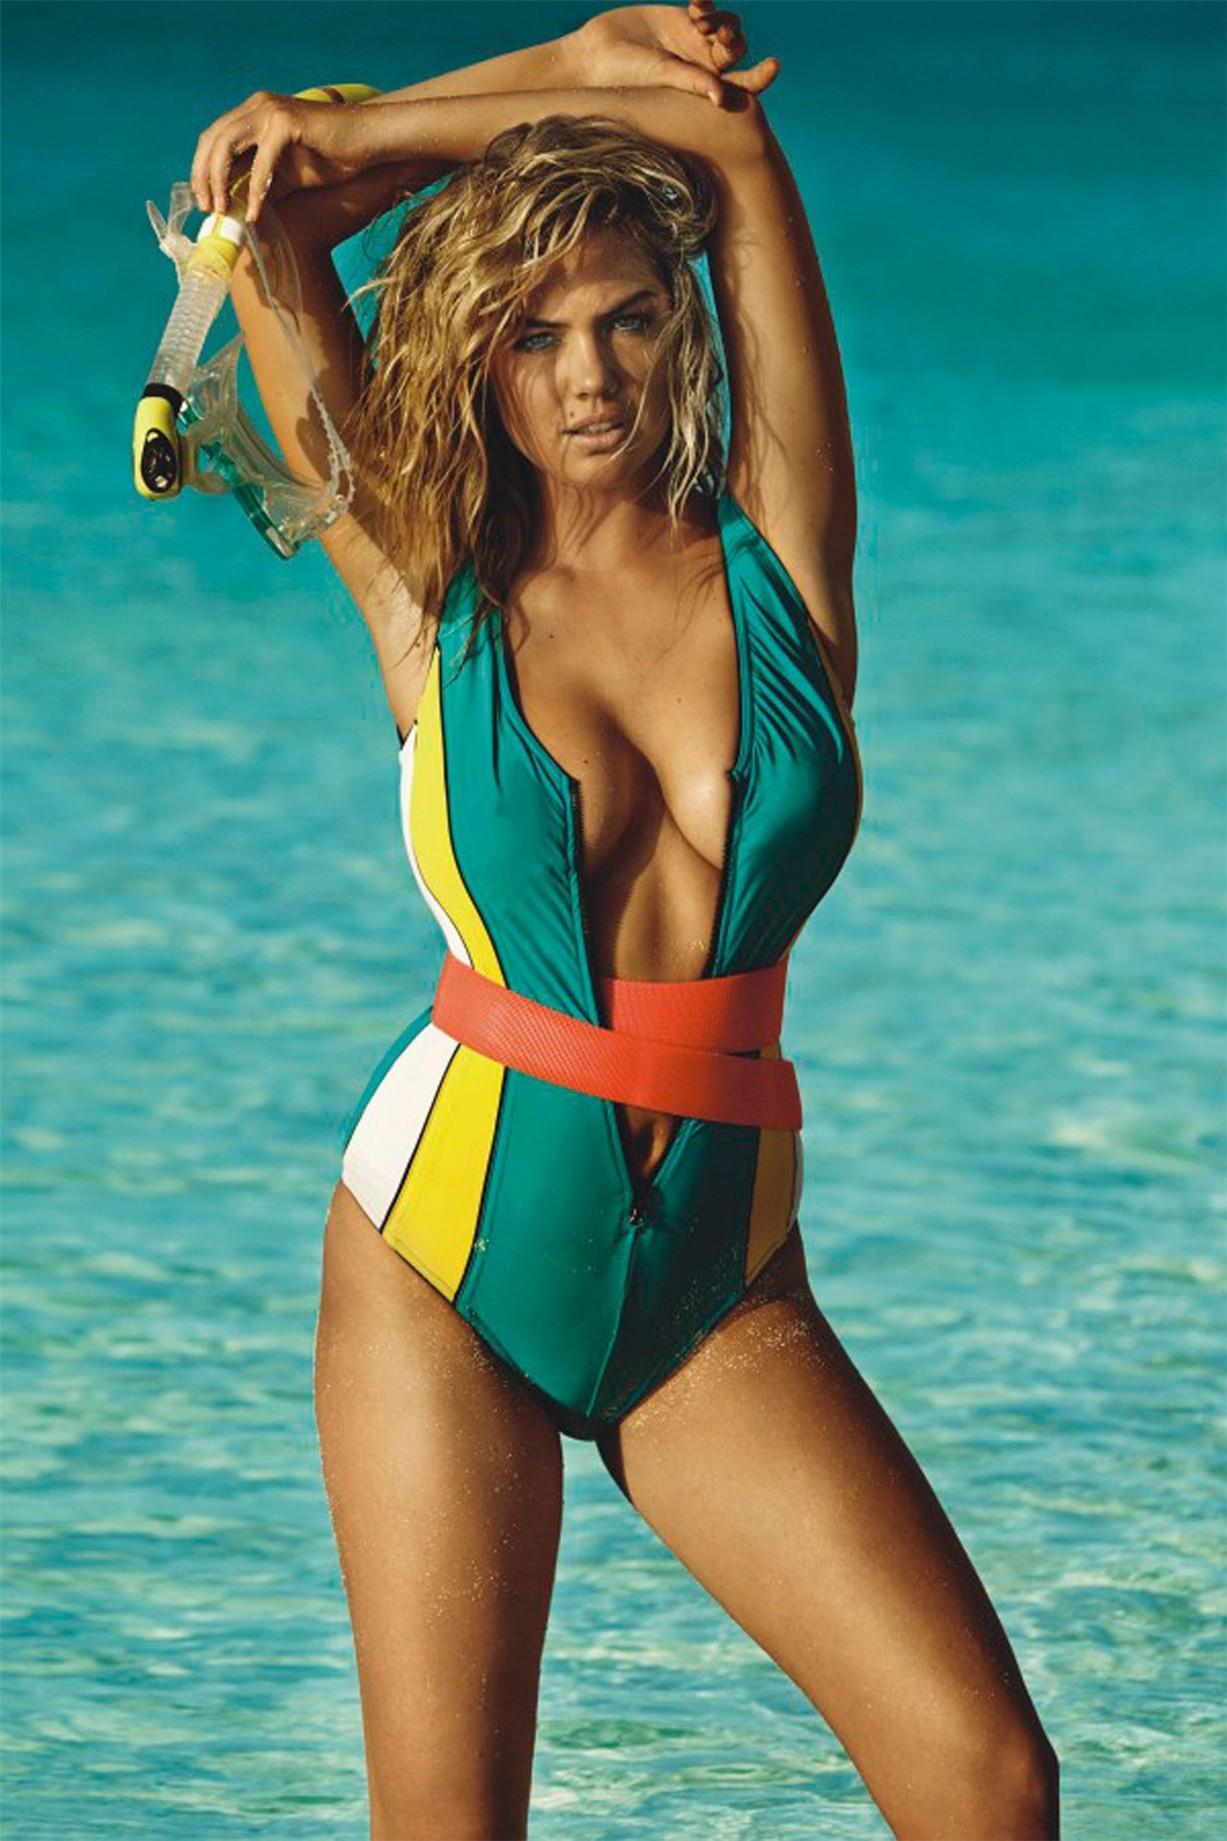 на пляже с Кейт Аптон / Kate Upton by Mario Testino in Vogue UK june 2014